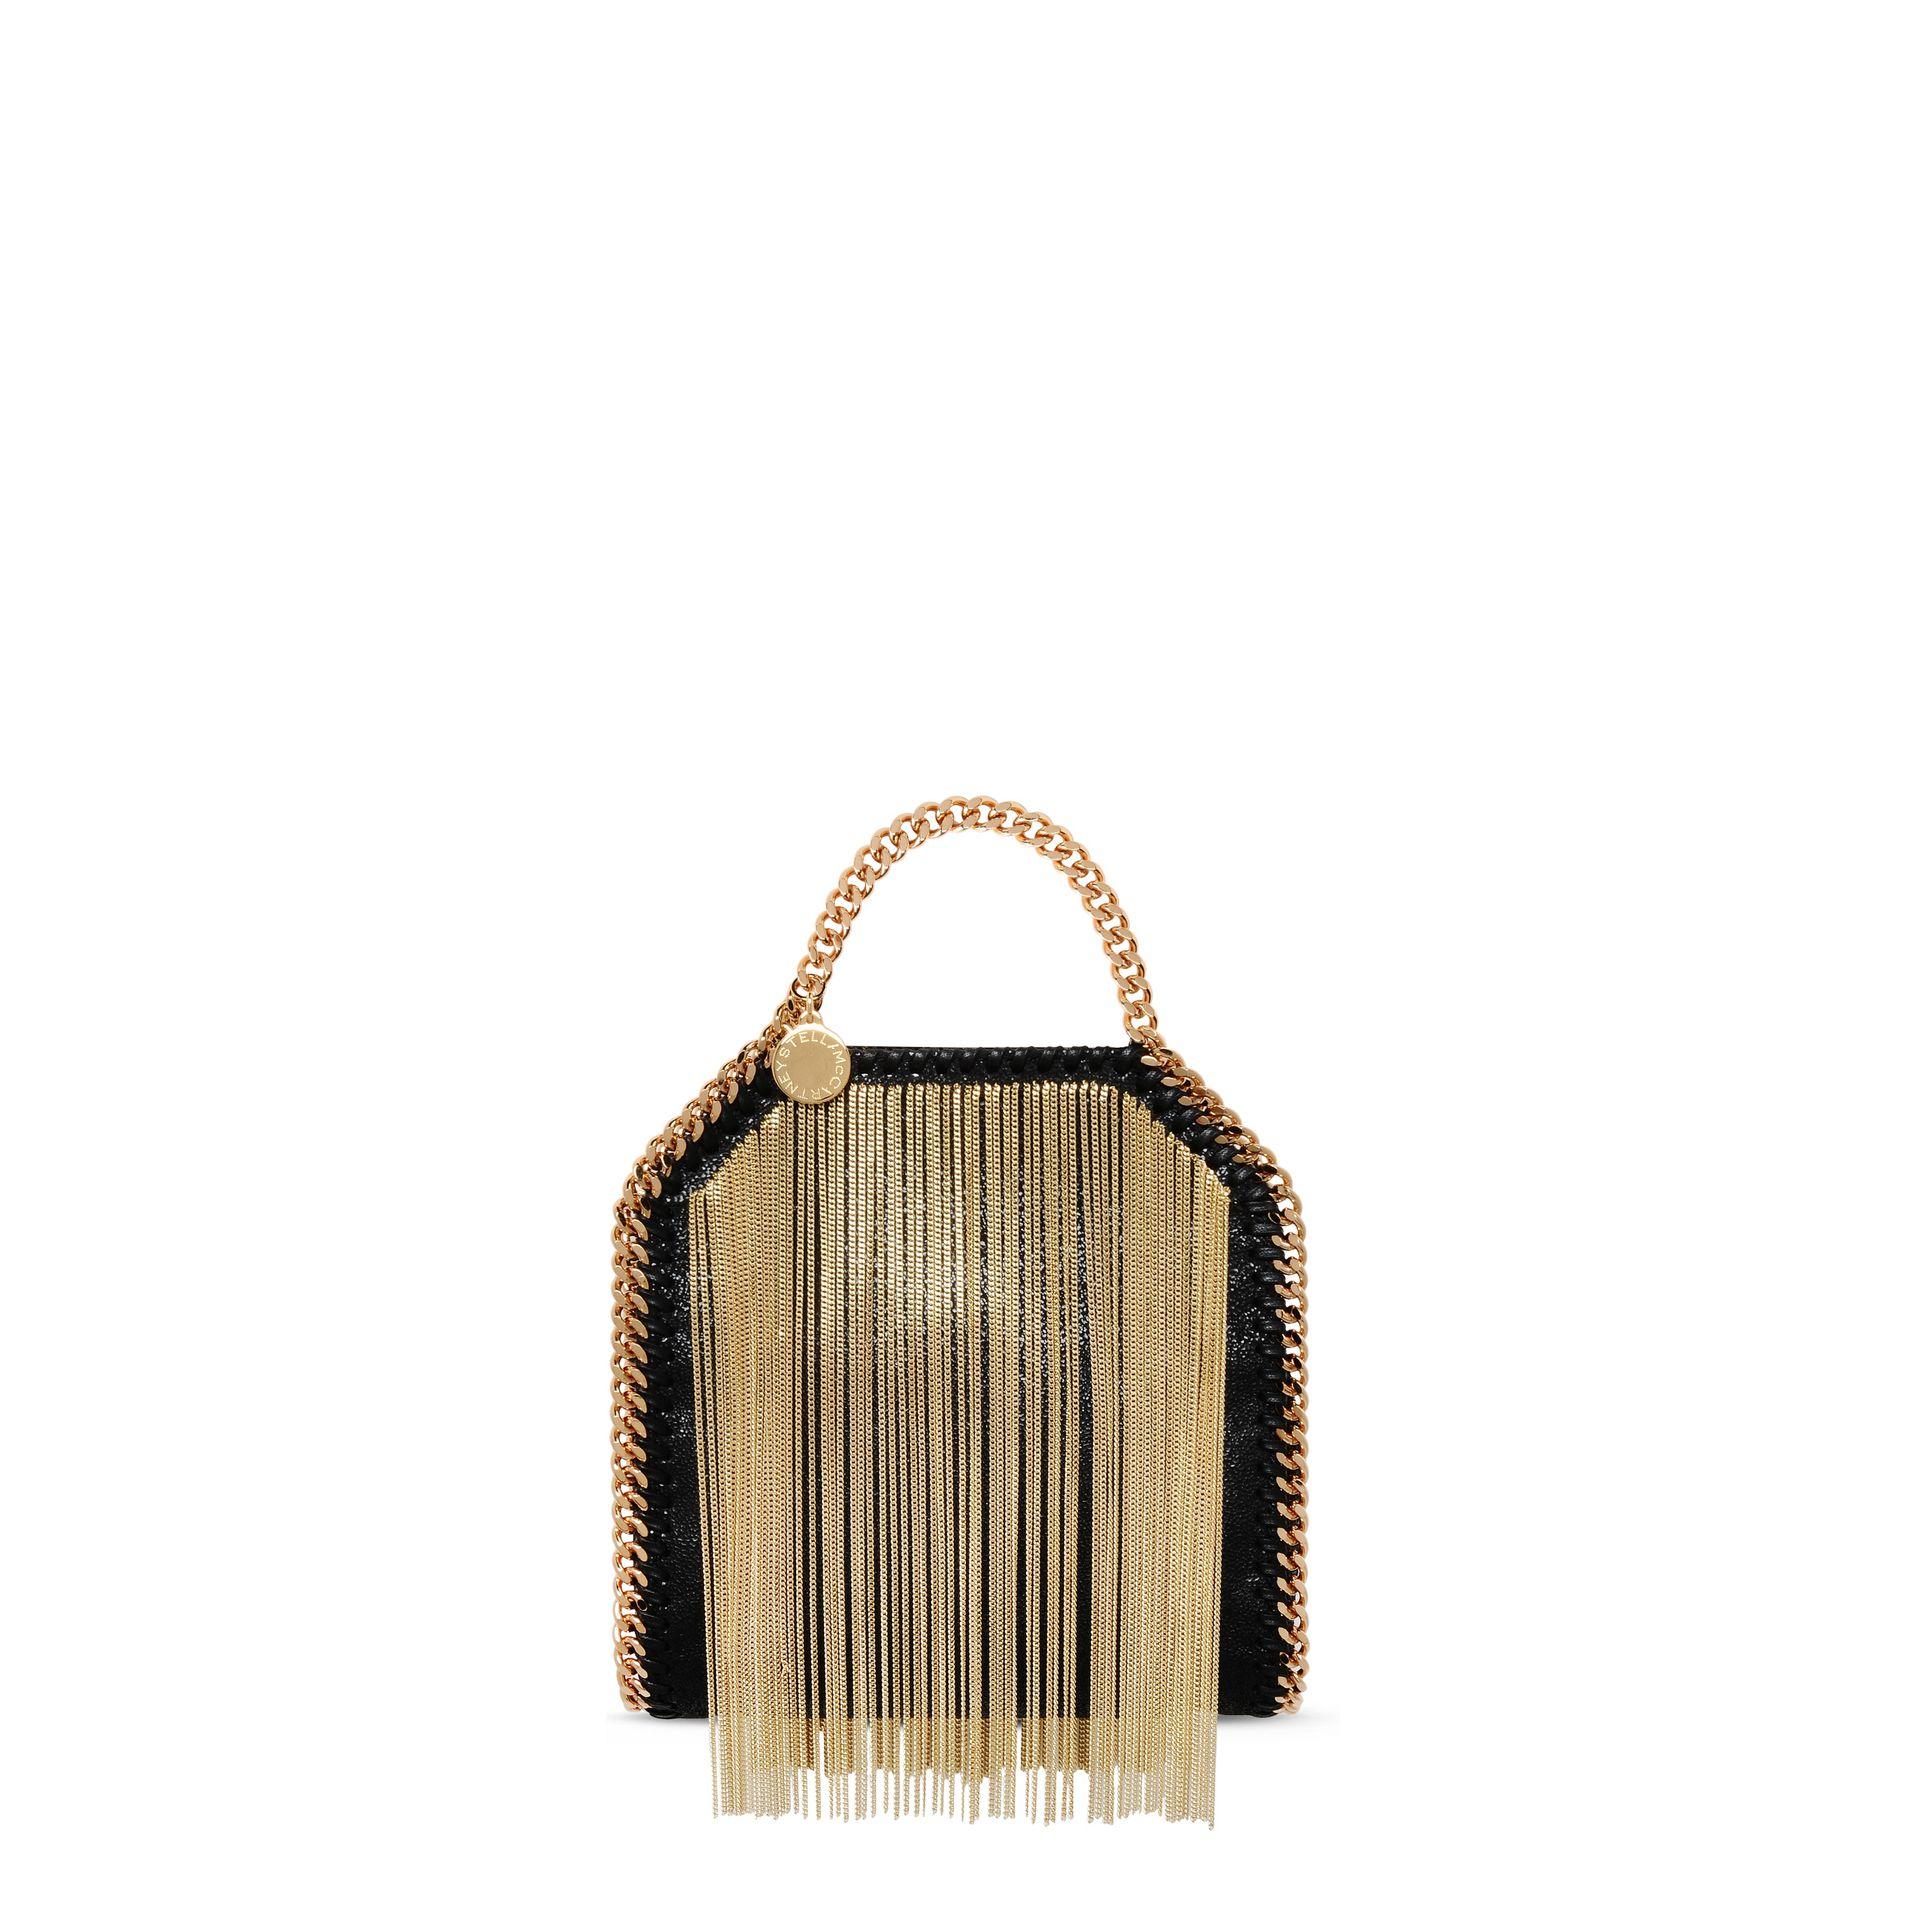 Stella McCartney Falabella Chain Fringed Tiny Tote in Metallic - Lyst 420e213c2cf57